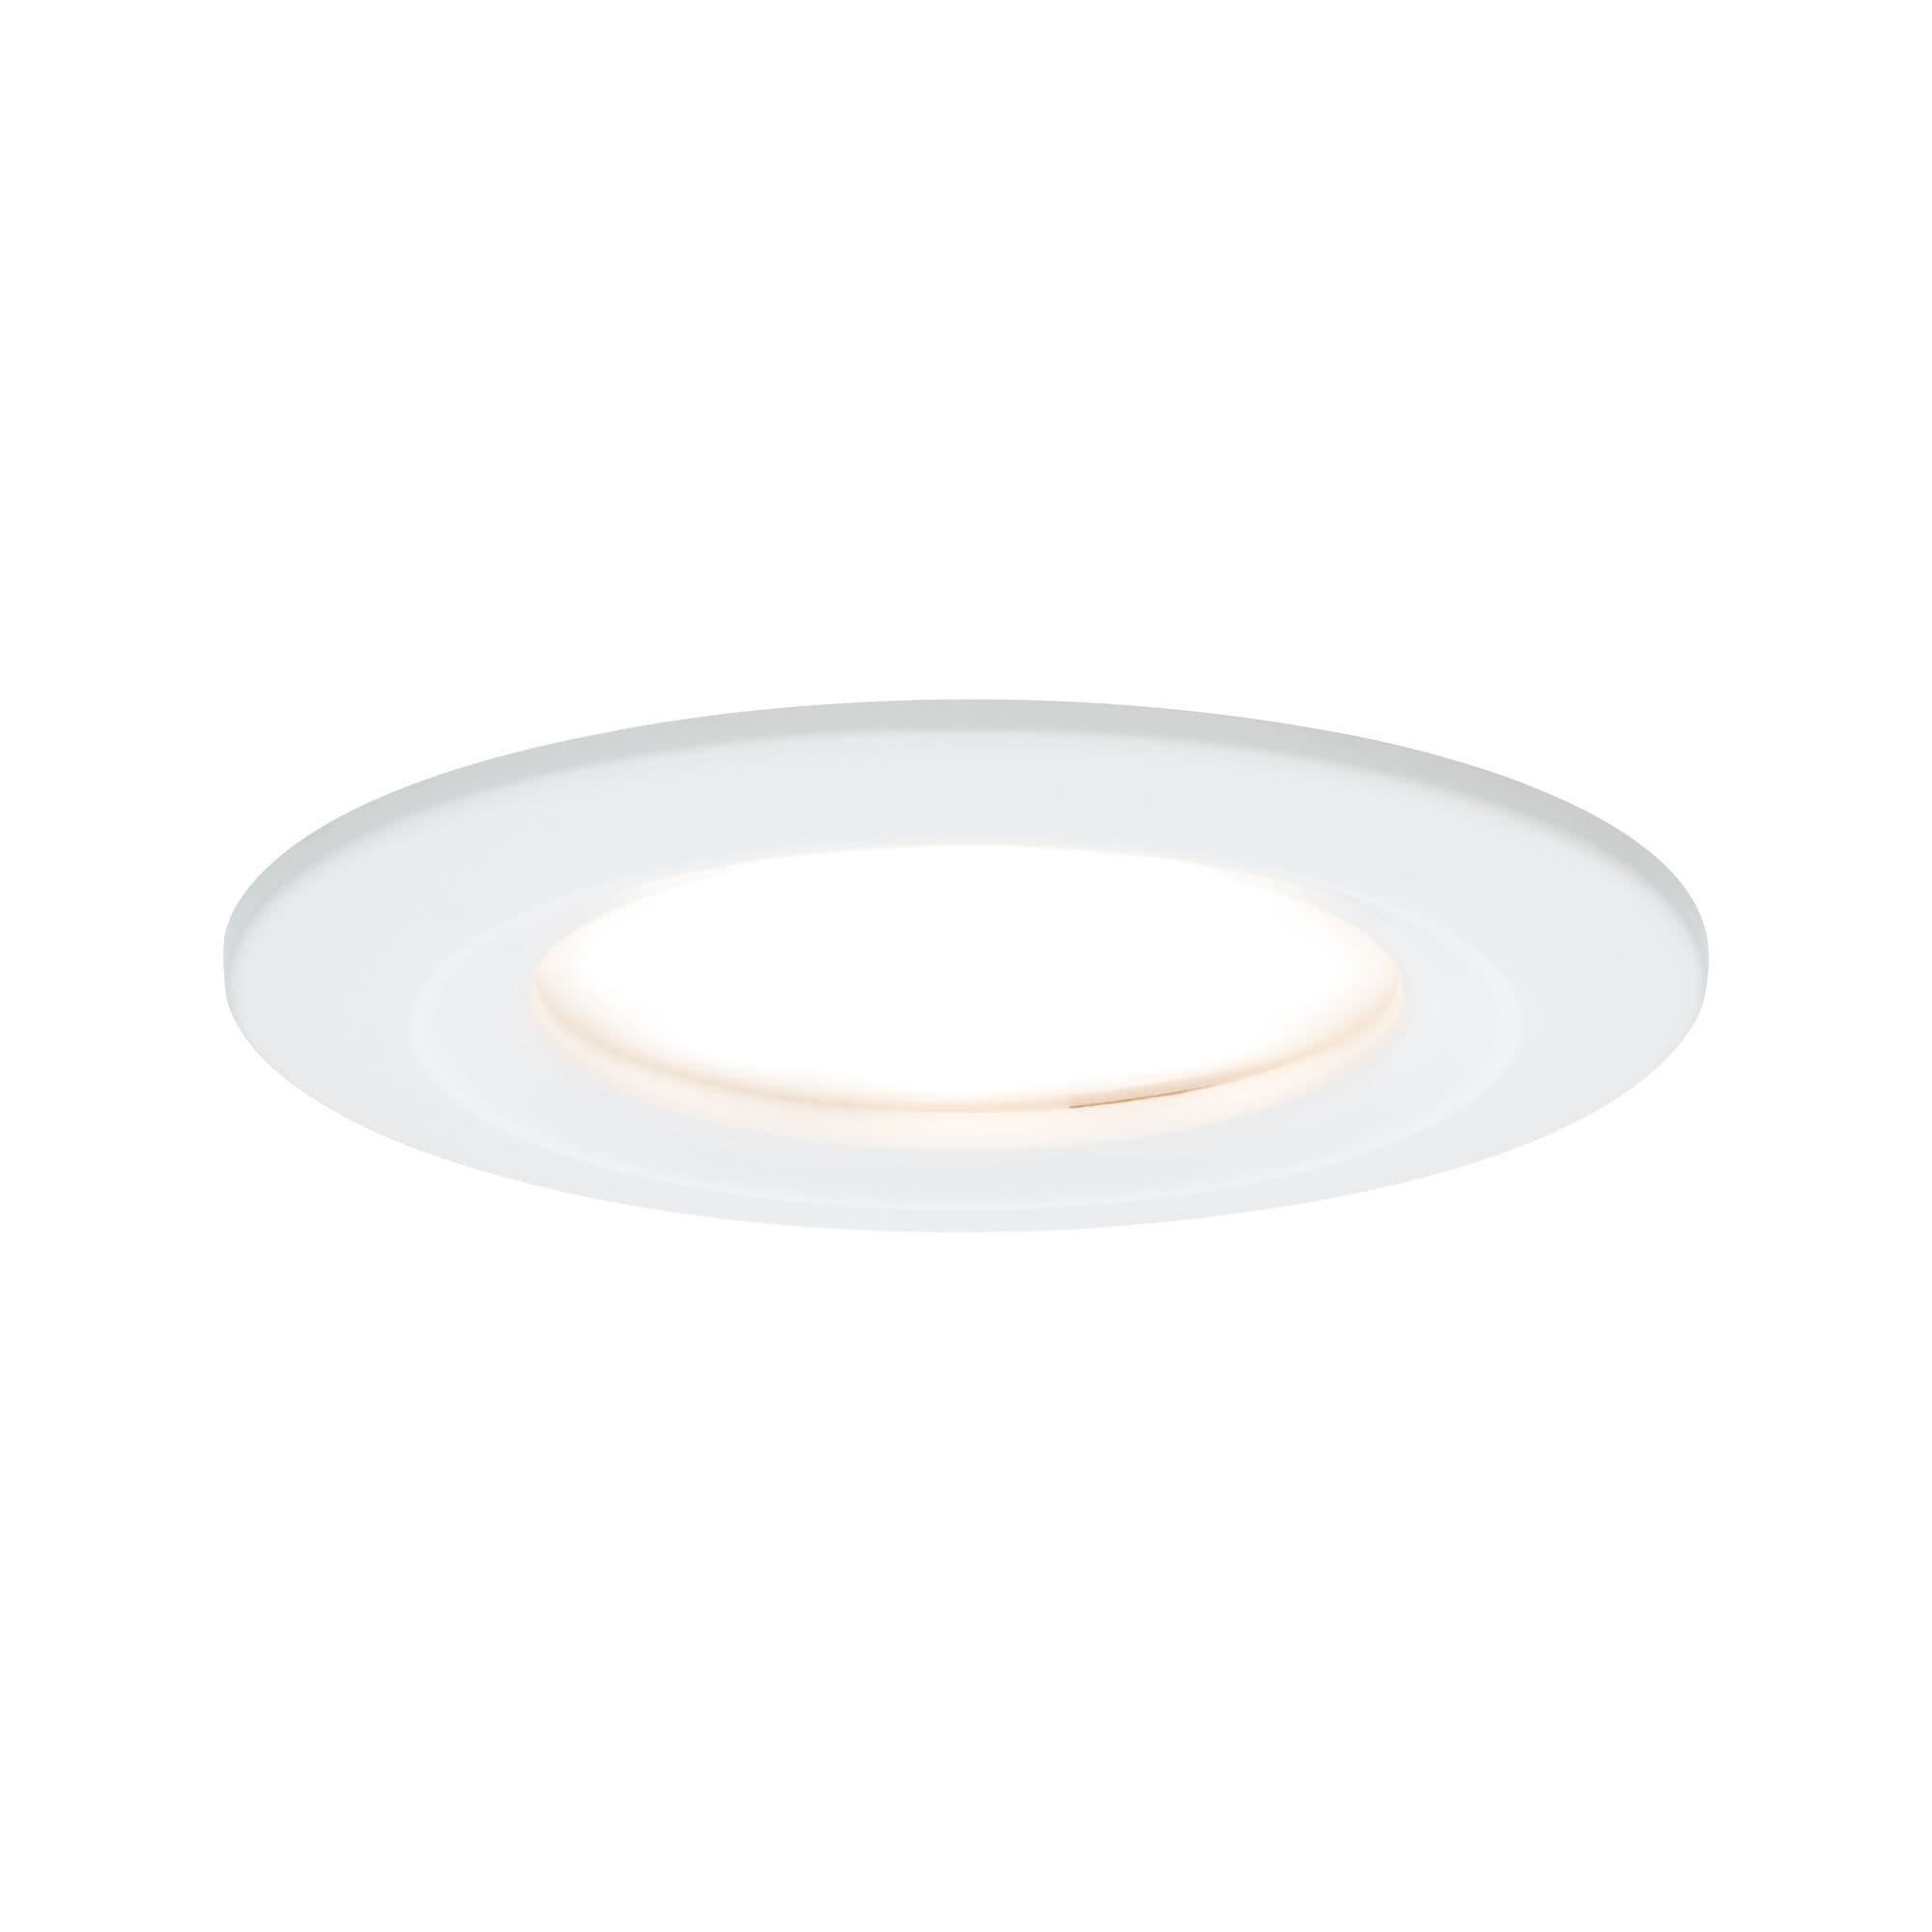 Paulmann LED Einbaustrahler Nova rund 3x6,5W Weiß matt starr 3-Stufen-dimmbar, 3 St., Warmweiß